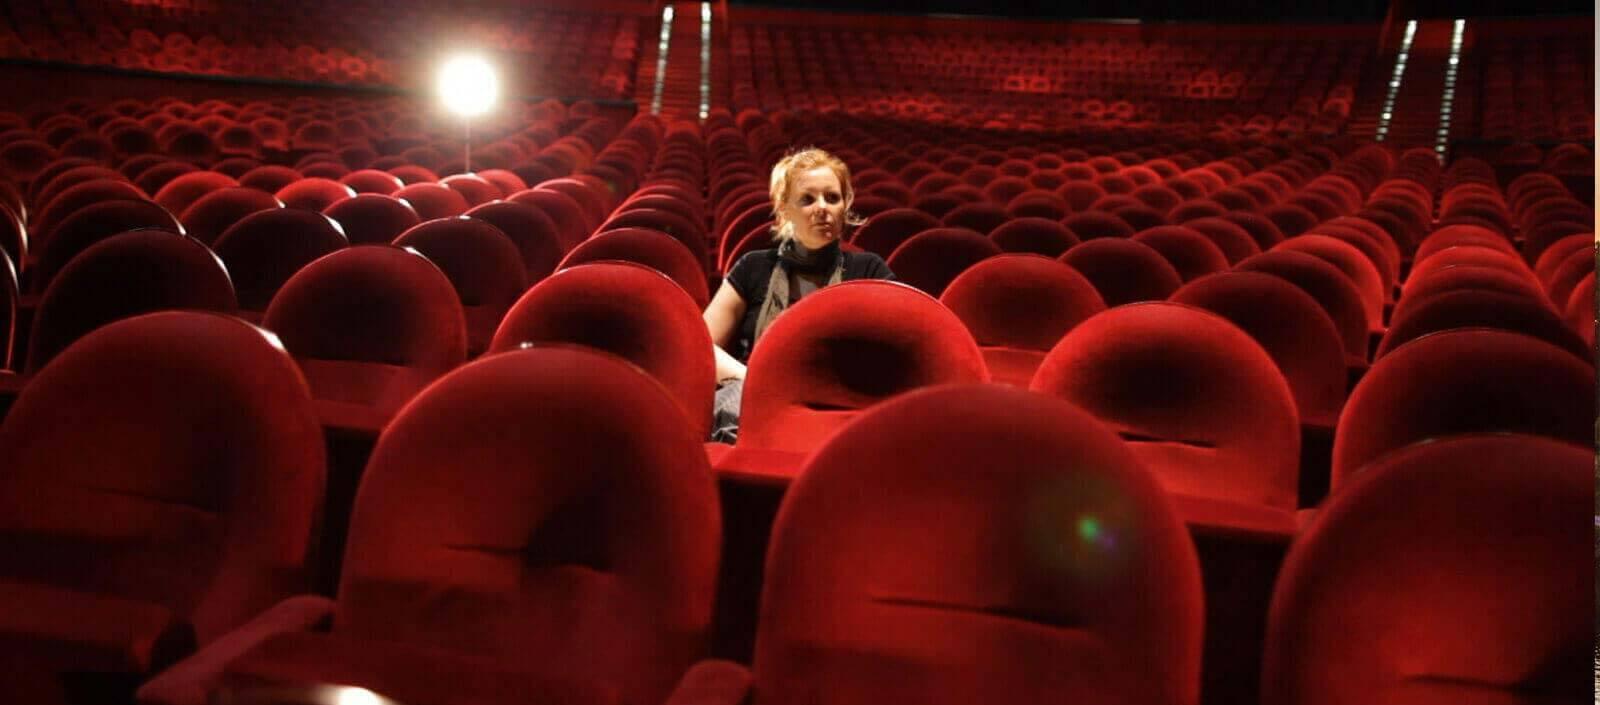 Metronom Theater Oberhausen